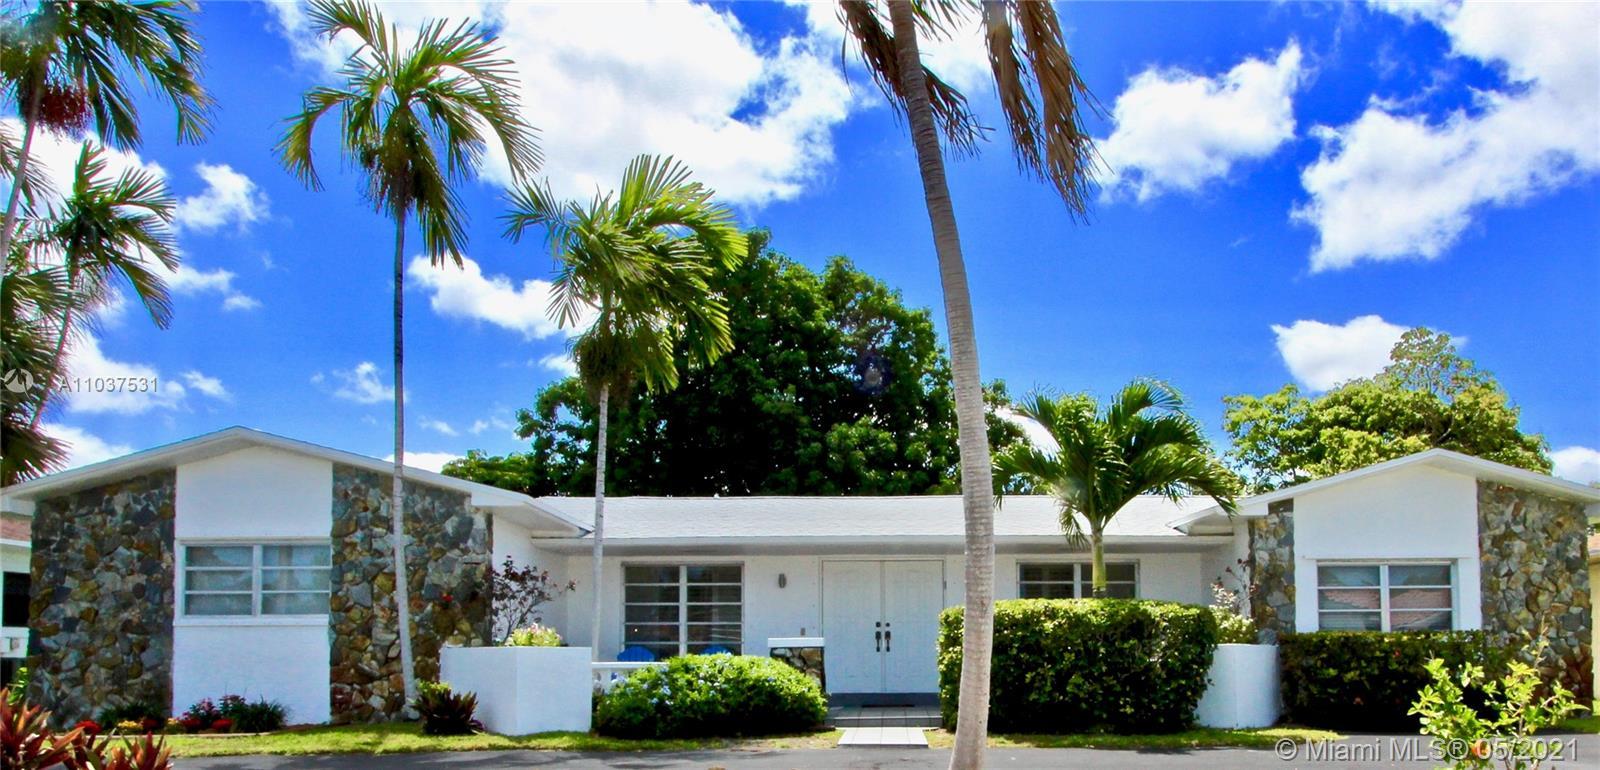 Highland Lakes - 21230 NE 19th Ave, Miami, FL 33179